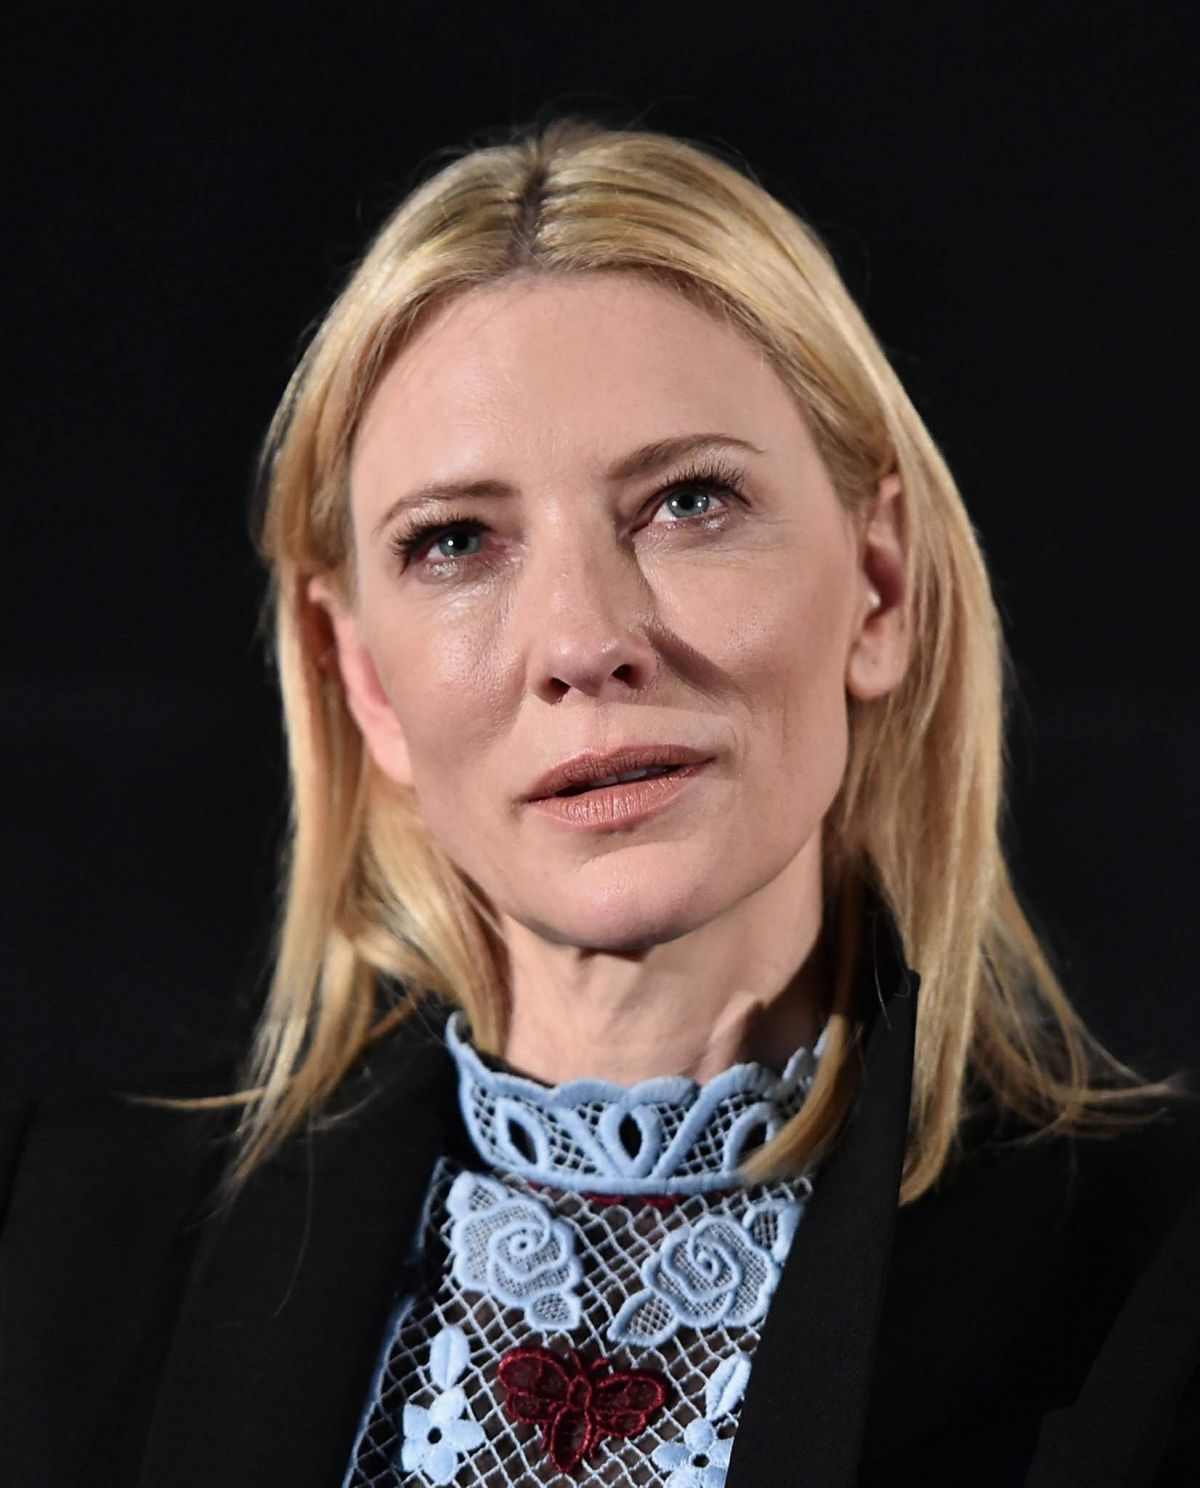 CATE BLANCHETT at Carol Screening and Q&A 01/07/2016 ... Cate Blanchett 2016